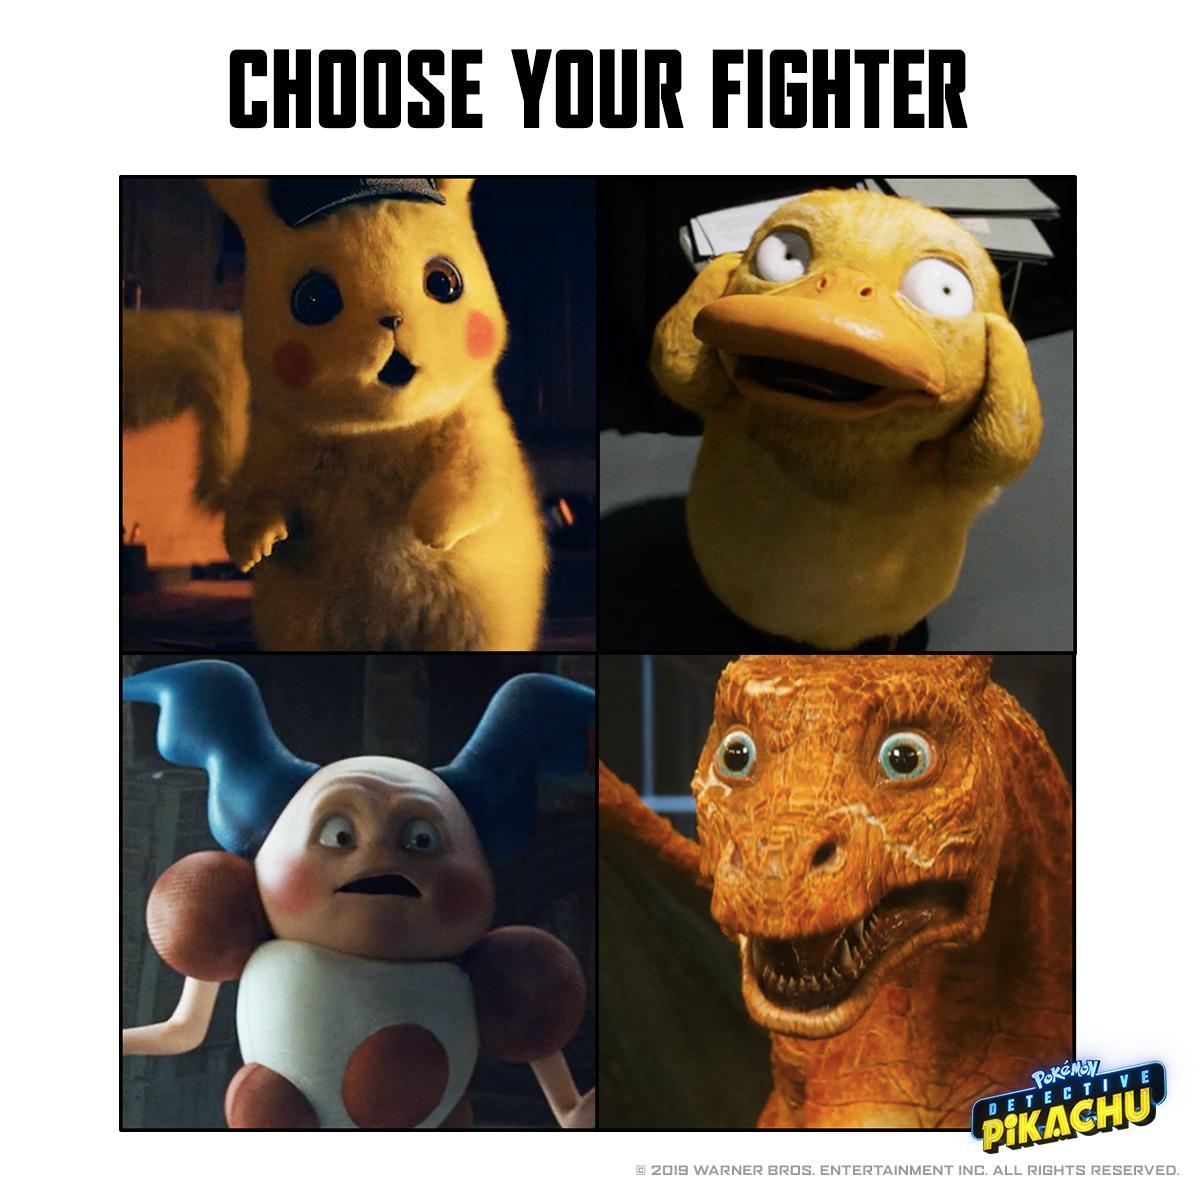 Choose carefully. #DetectivePikachu